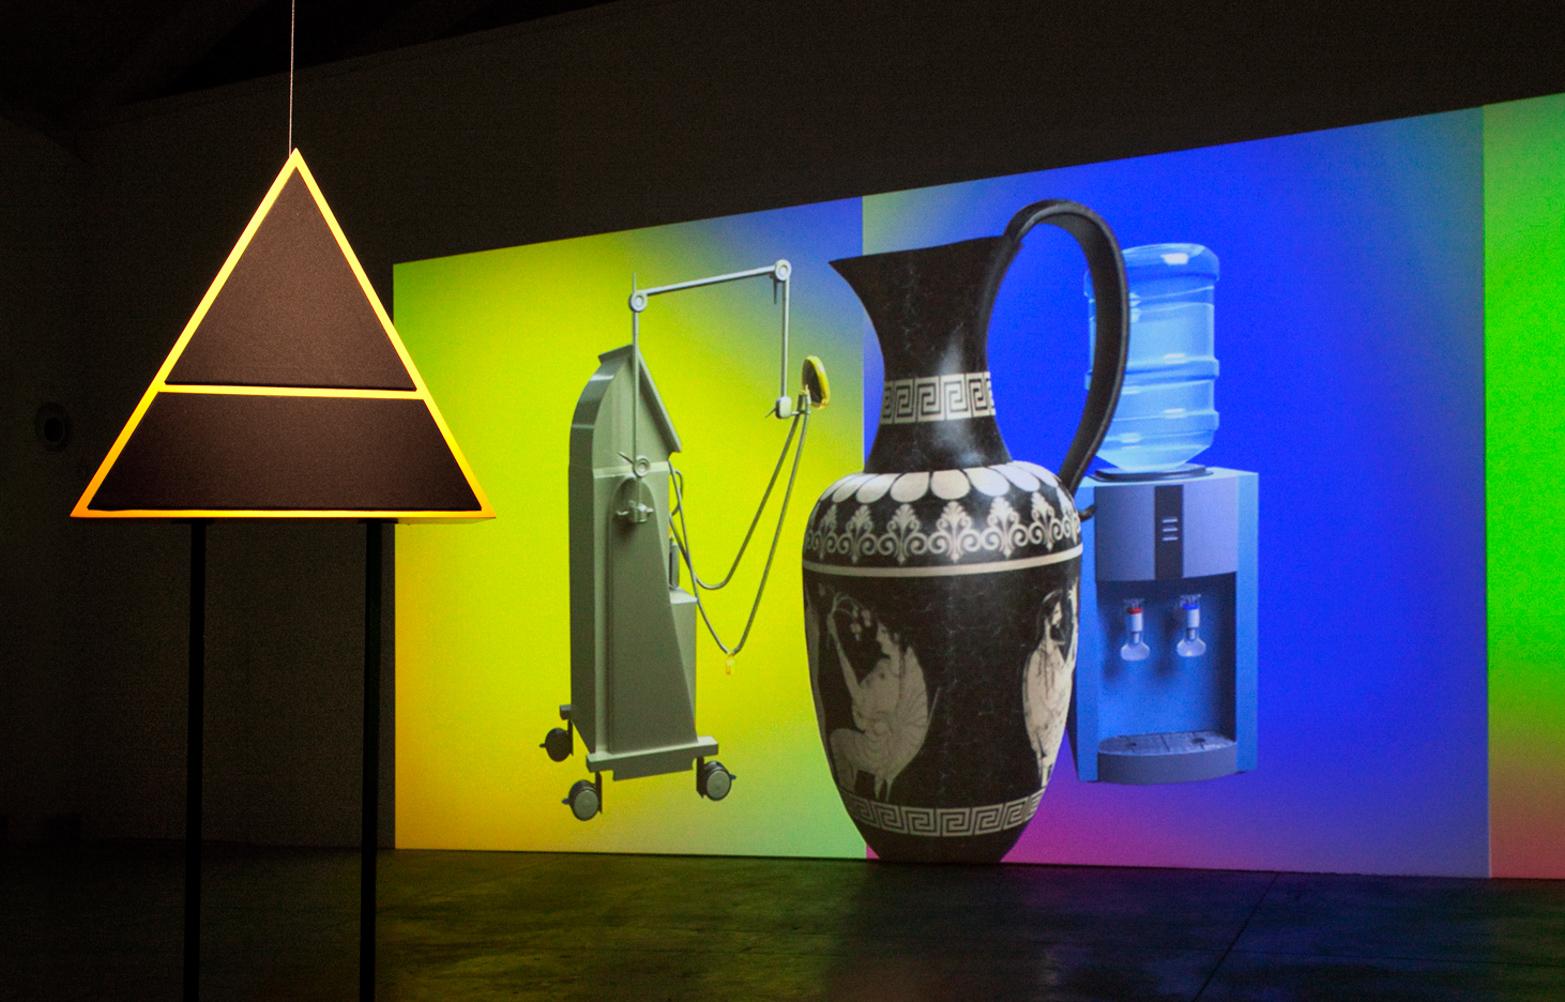 David Ferrando Giraut, SPEECH PROSTHESIS (An Alchemical Conversation), 2014. Digital animation with quadraphonic sound and custom quadraphonic speakers.